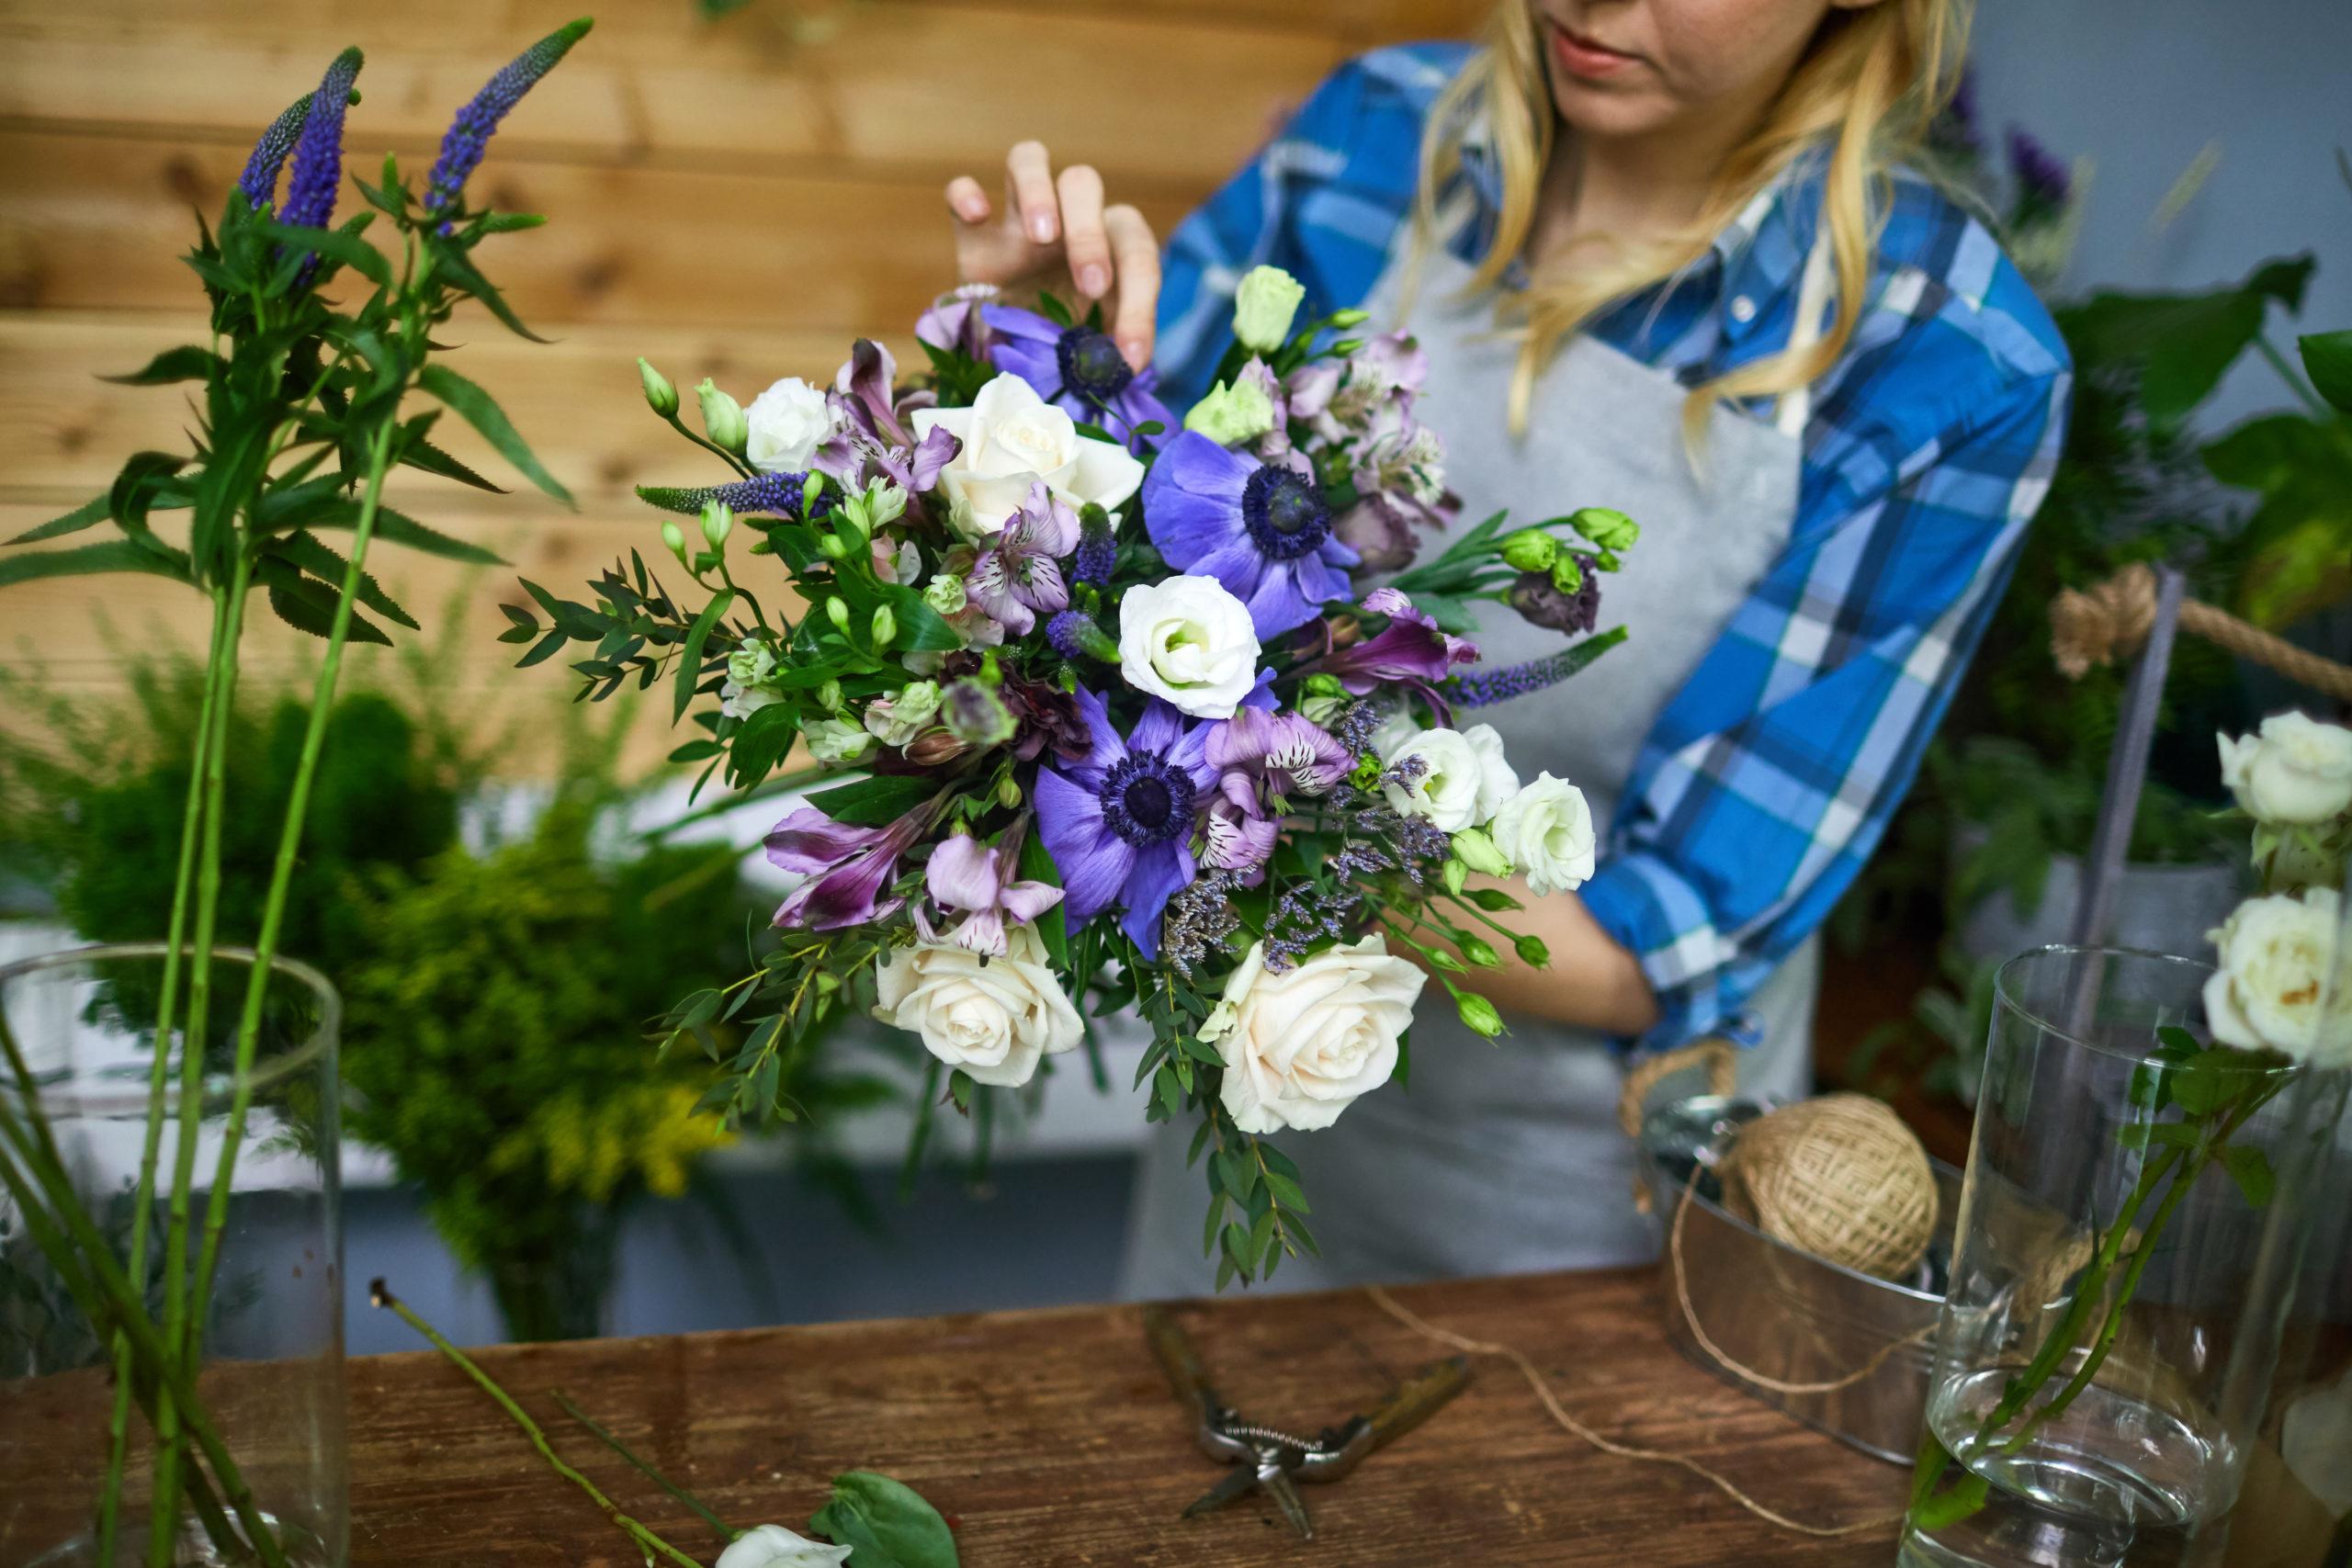 Young woman arranging floral bouquet